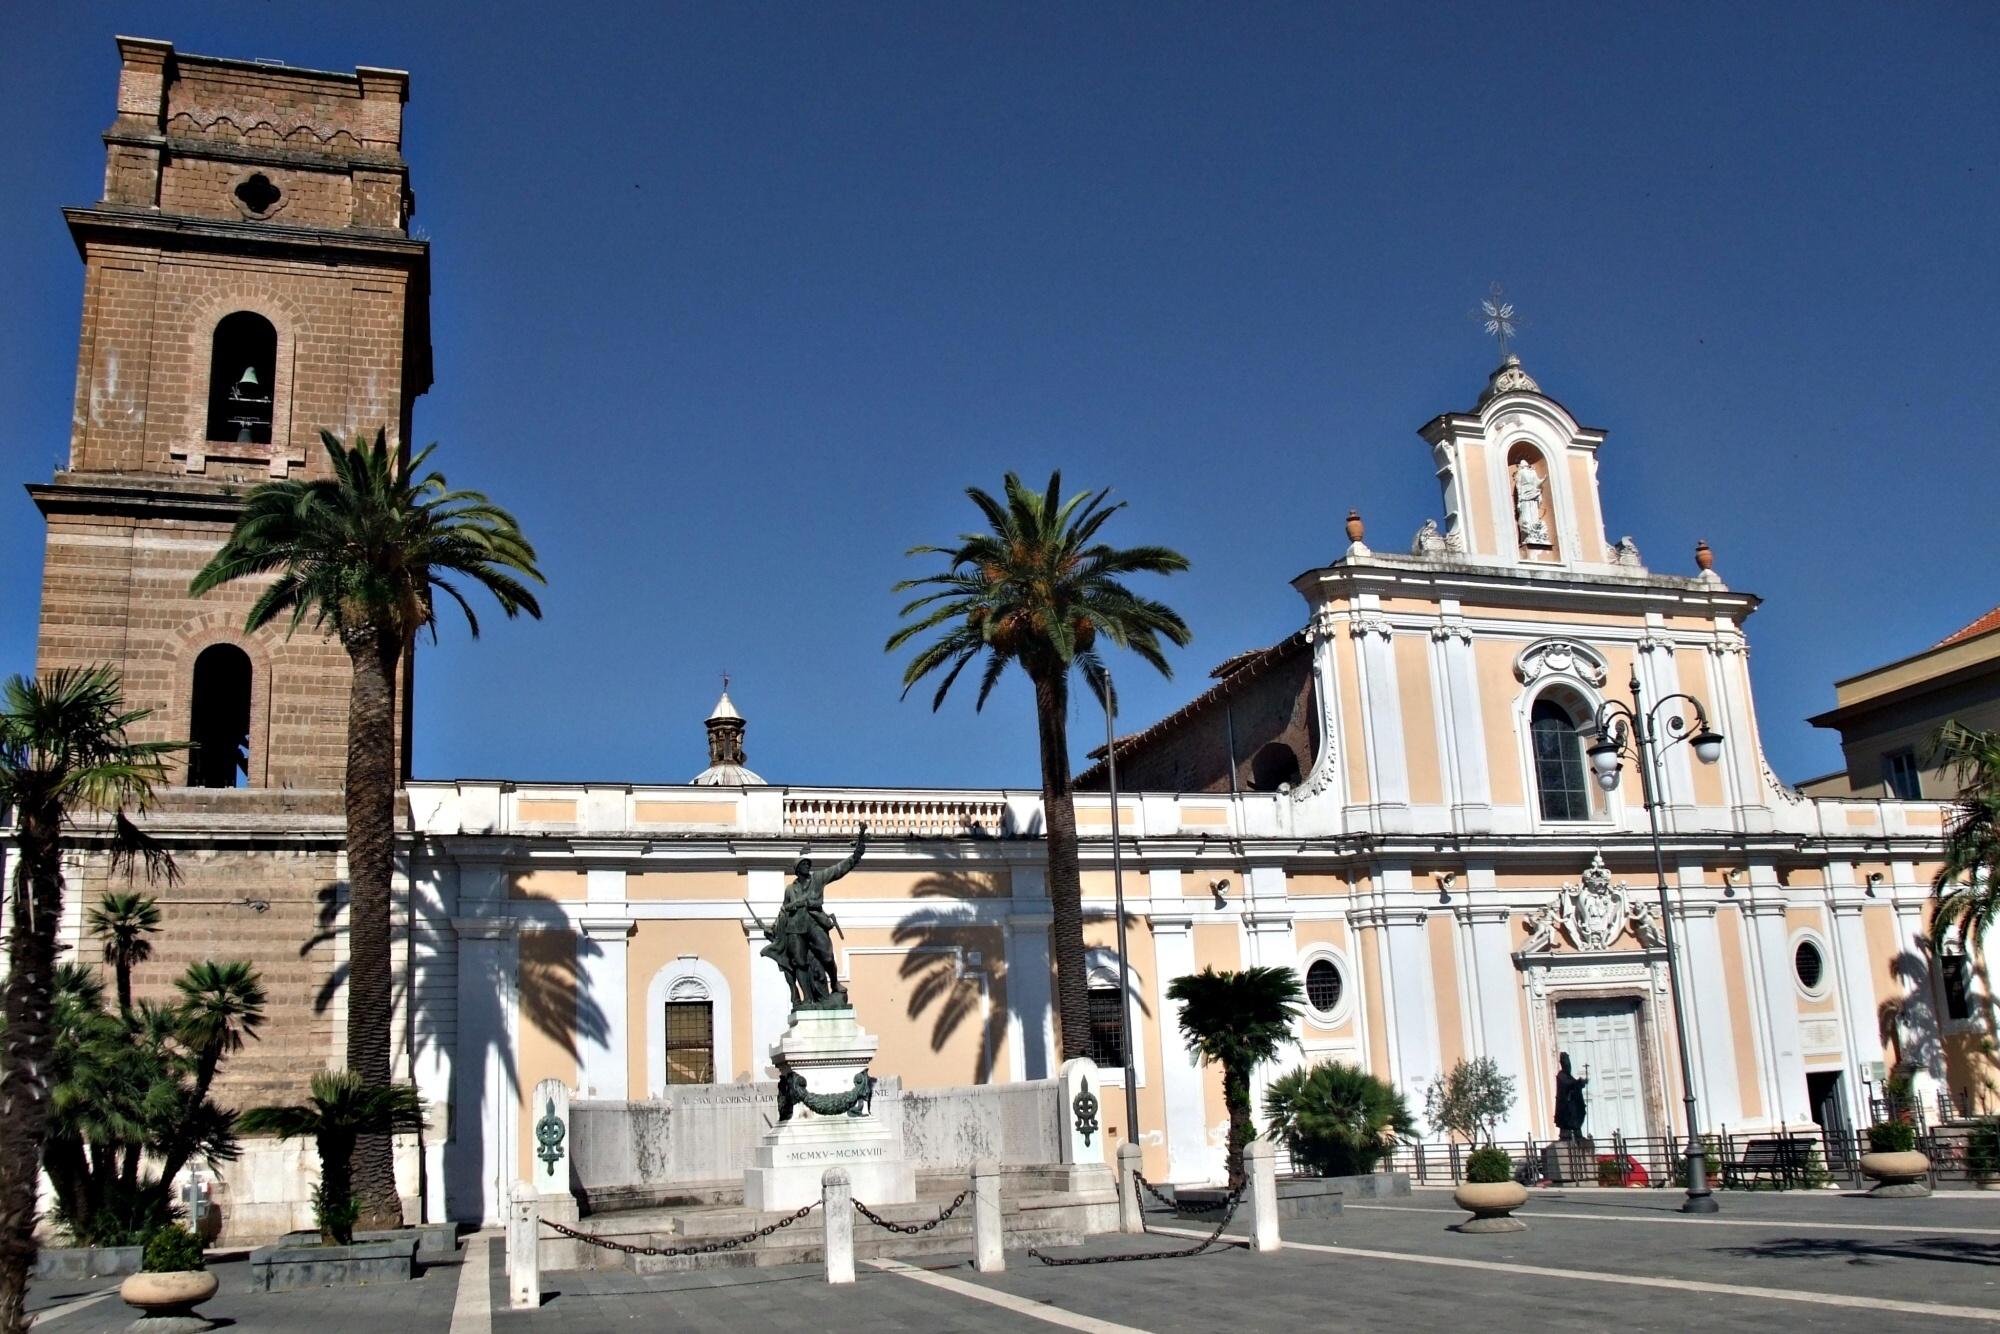 Duomo di Santa Maria Capua Vetere